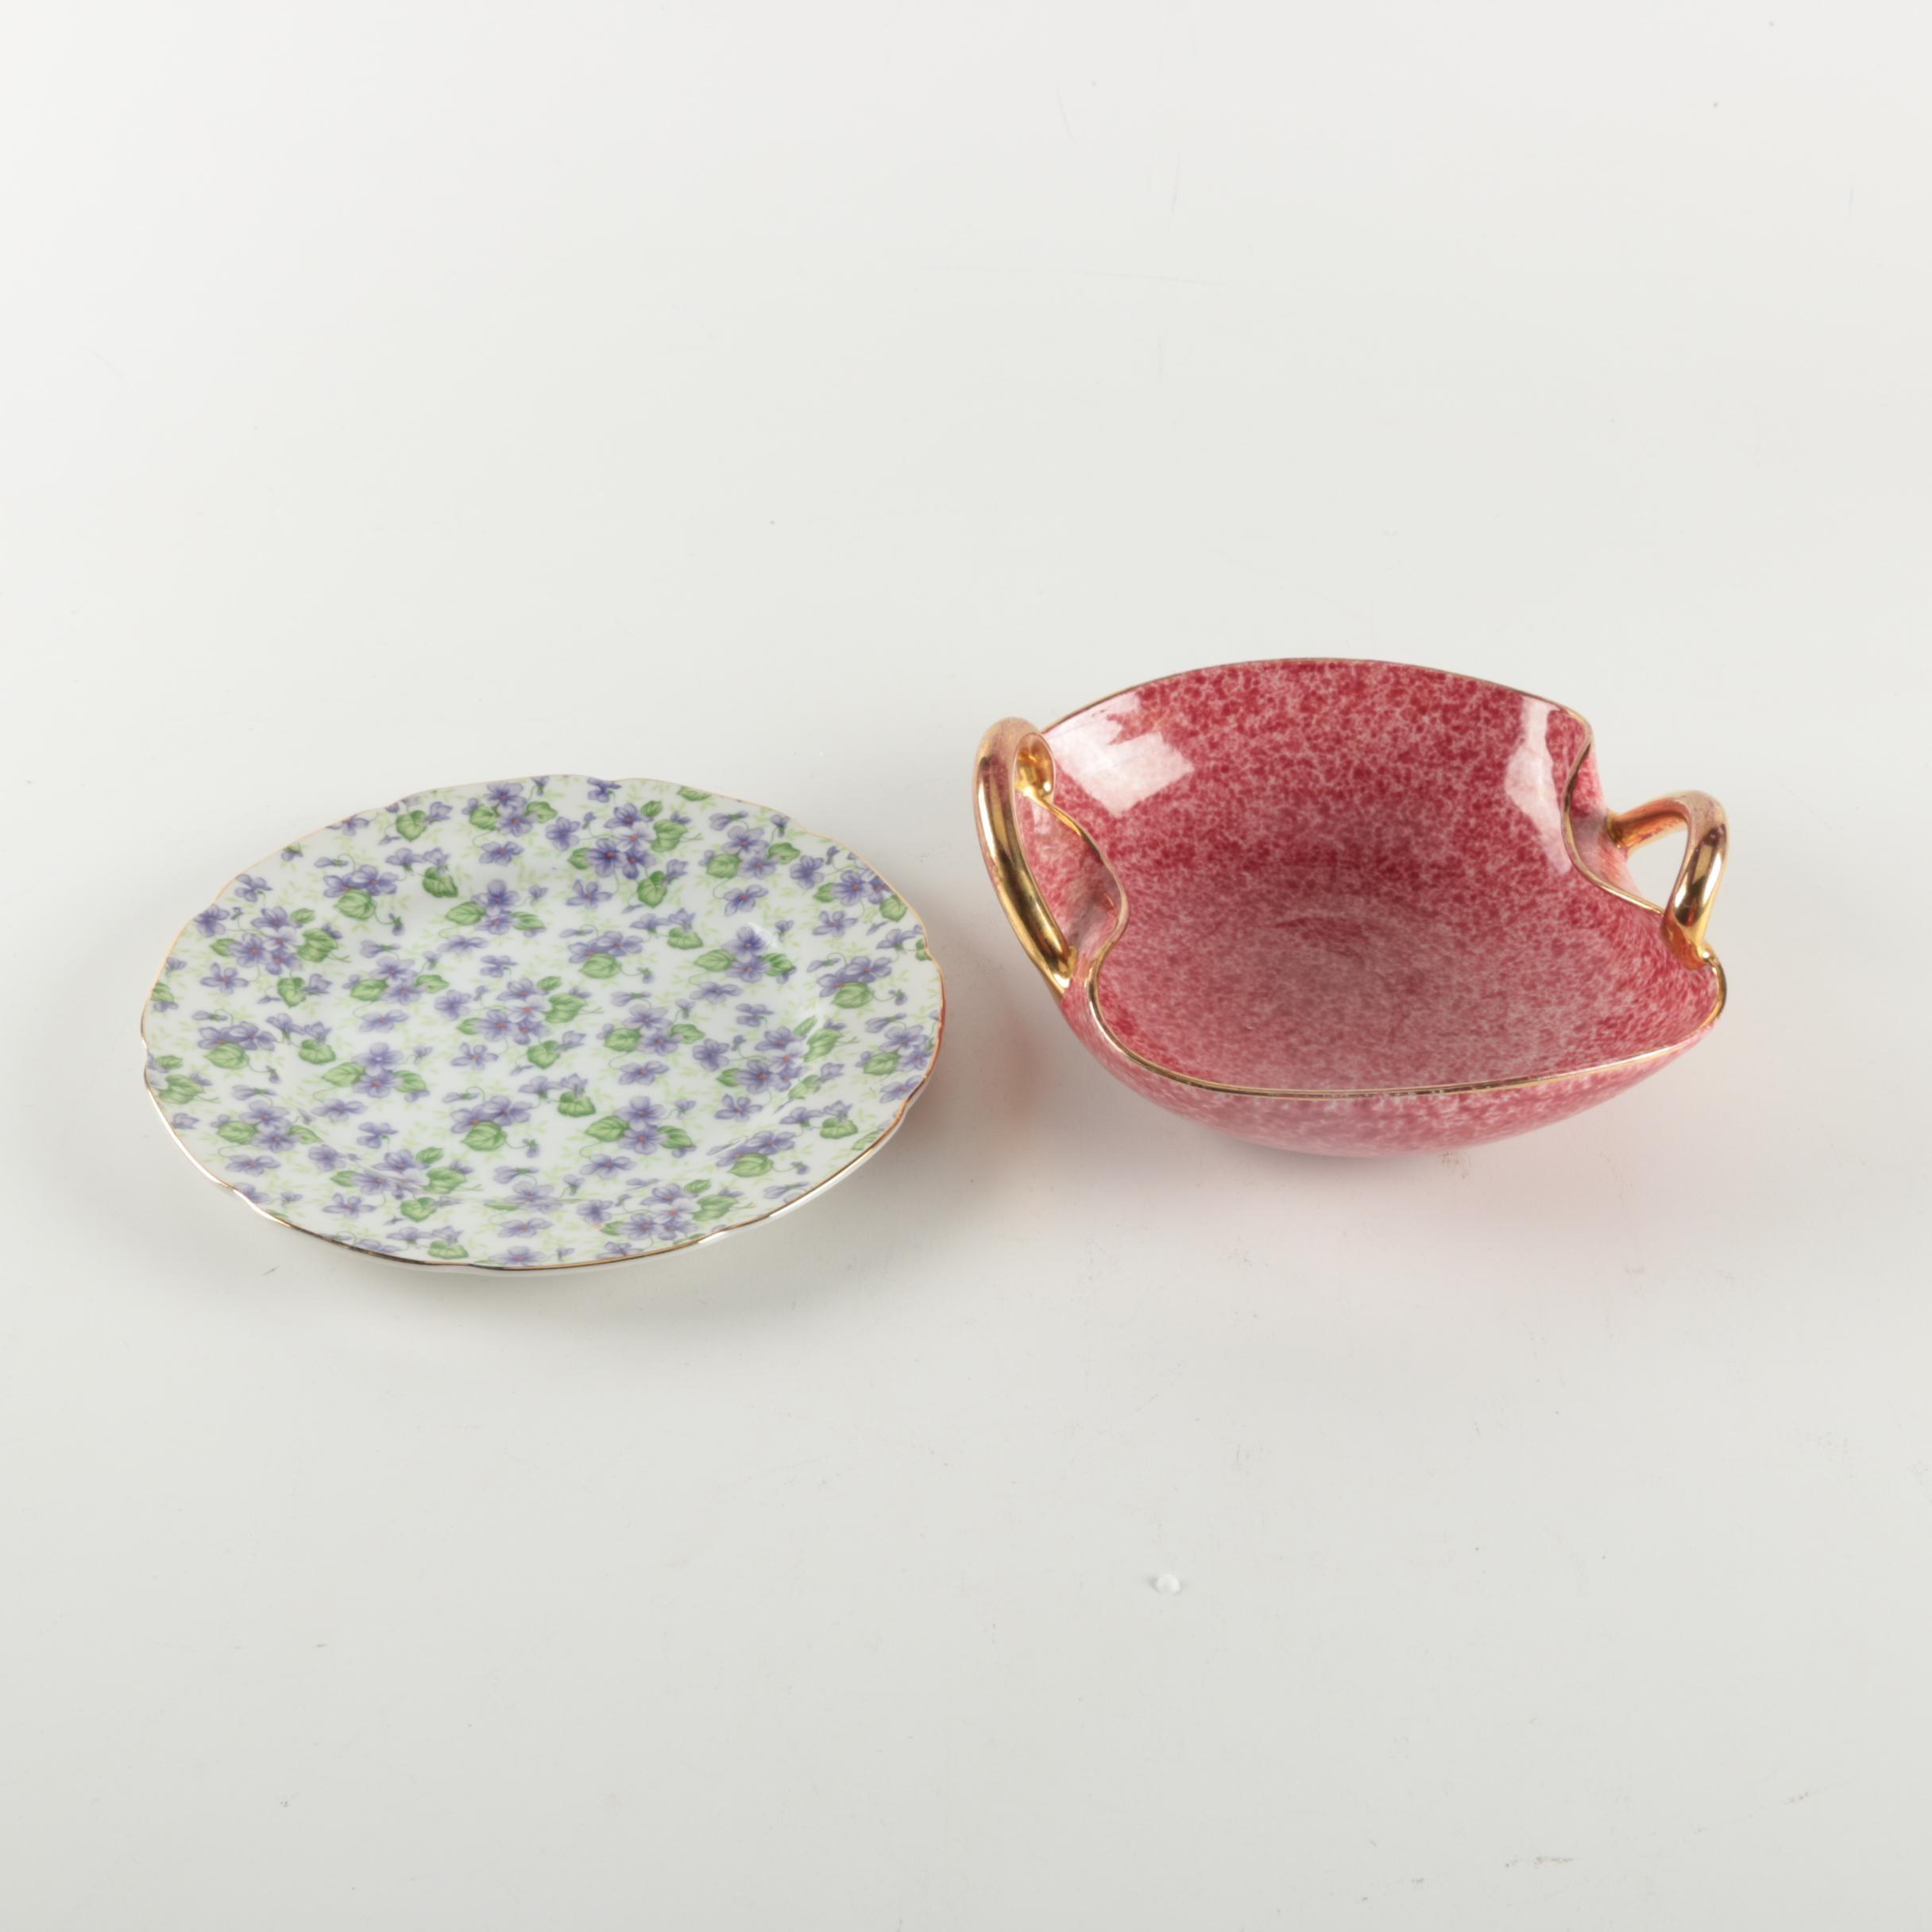 Porcelain Plate and Ceramic Bowl